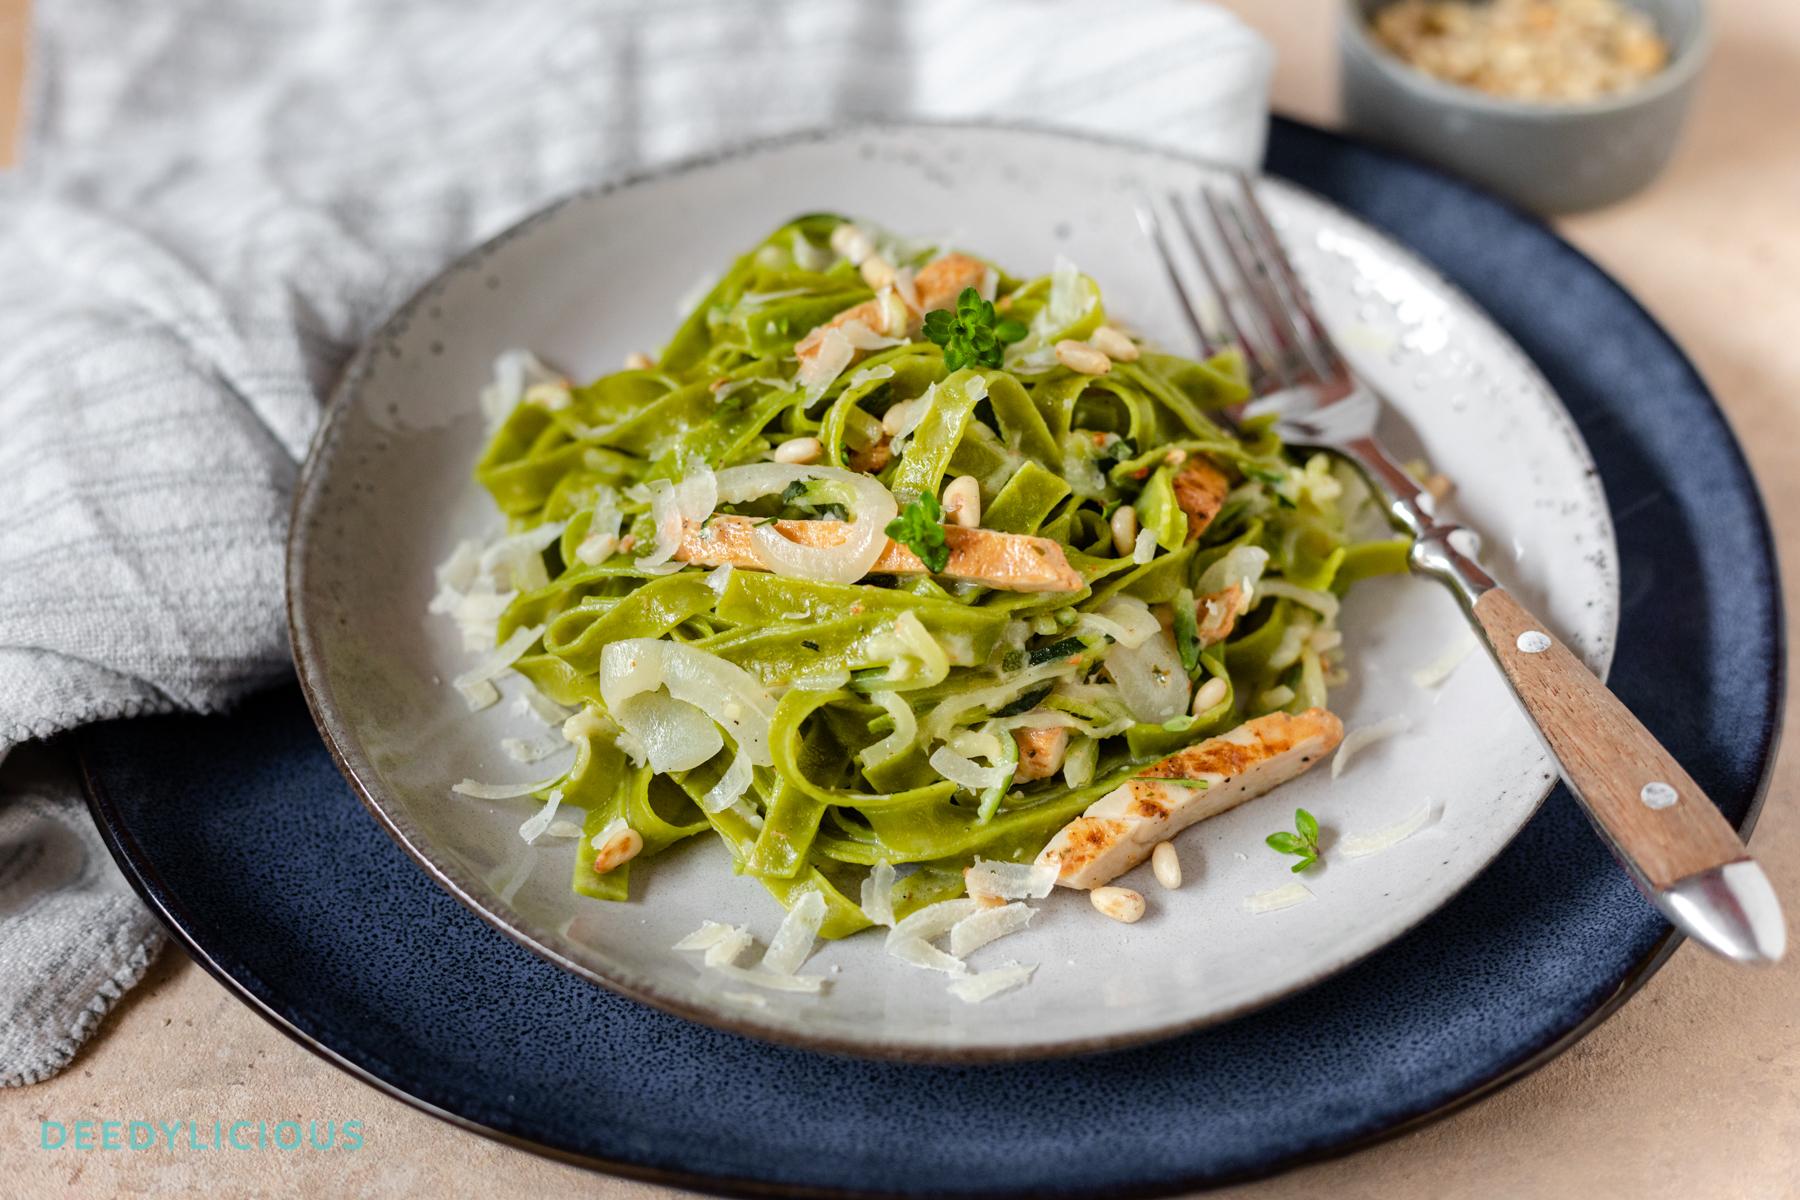 Groene Tagliatelle met courgetti, gebraden kip en kaassaus op een bord